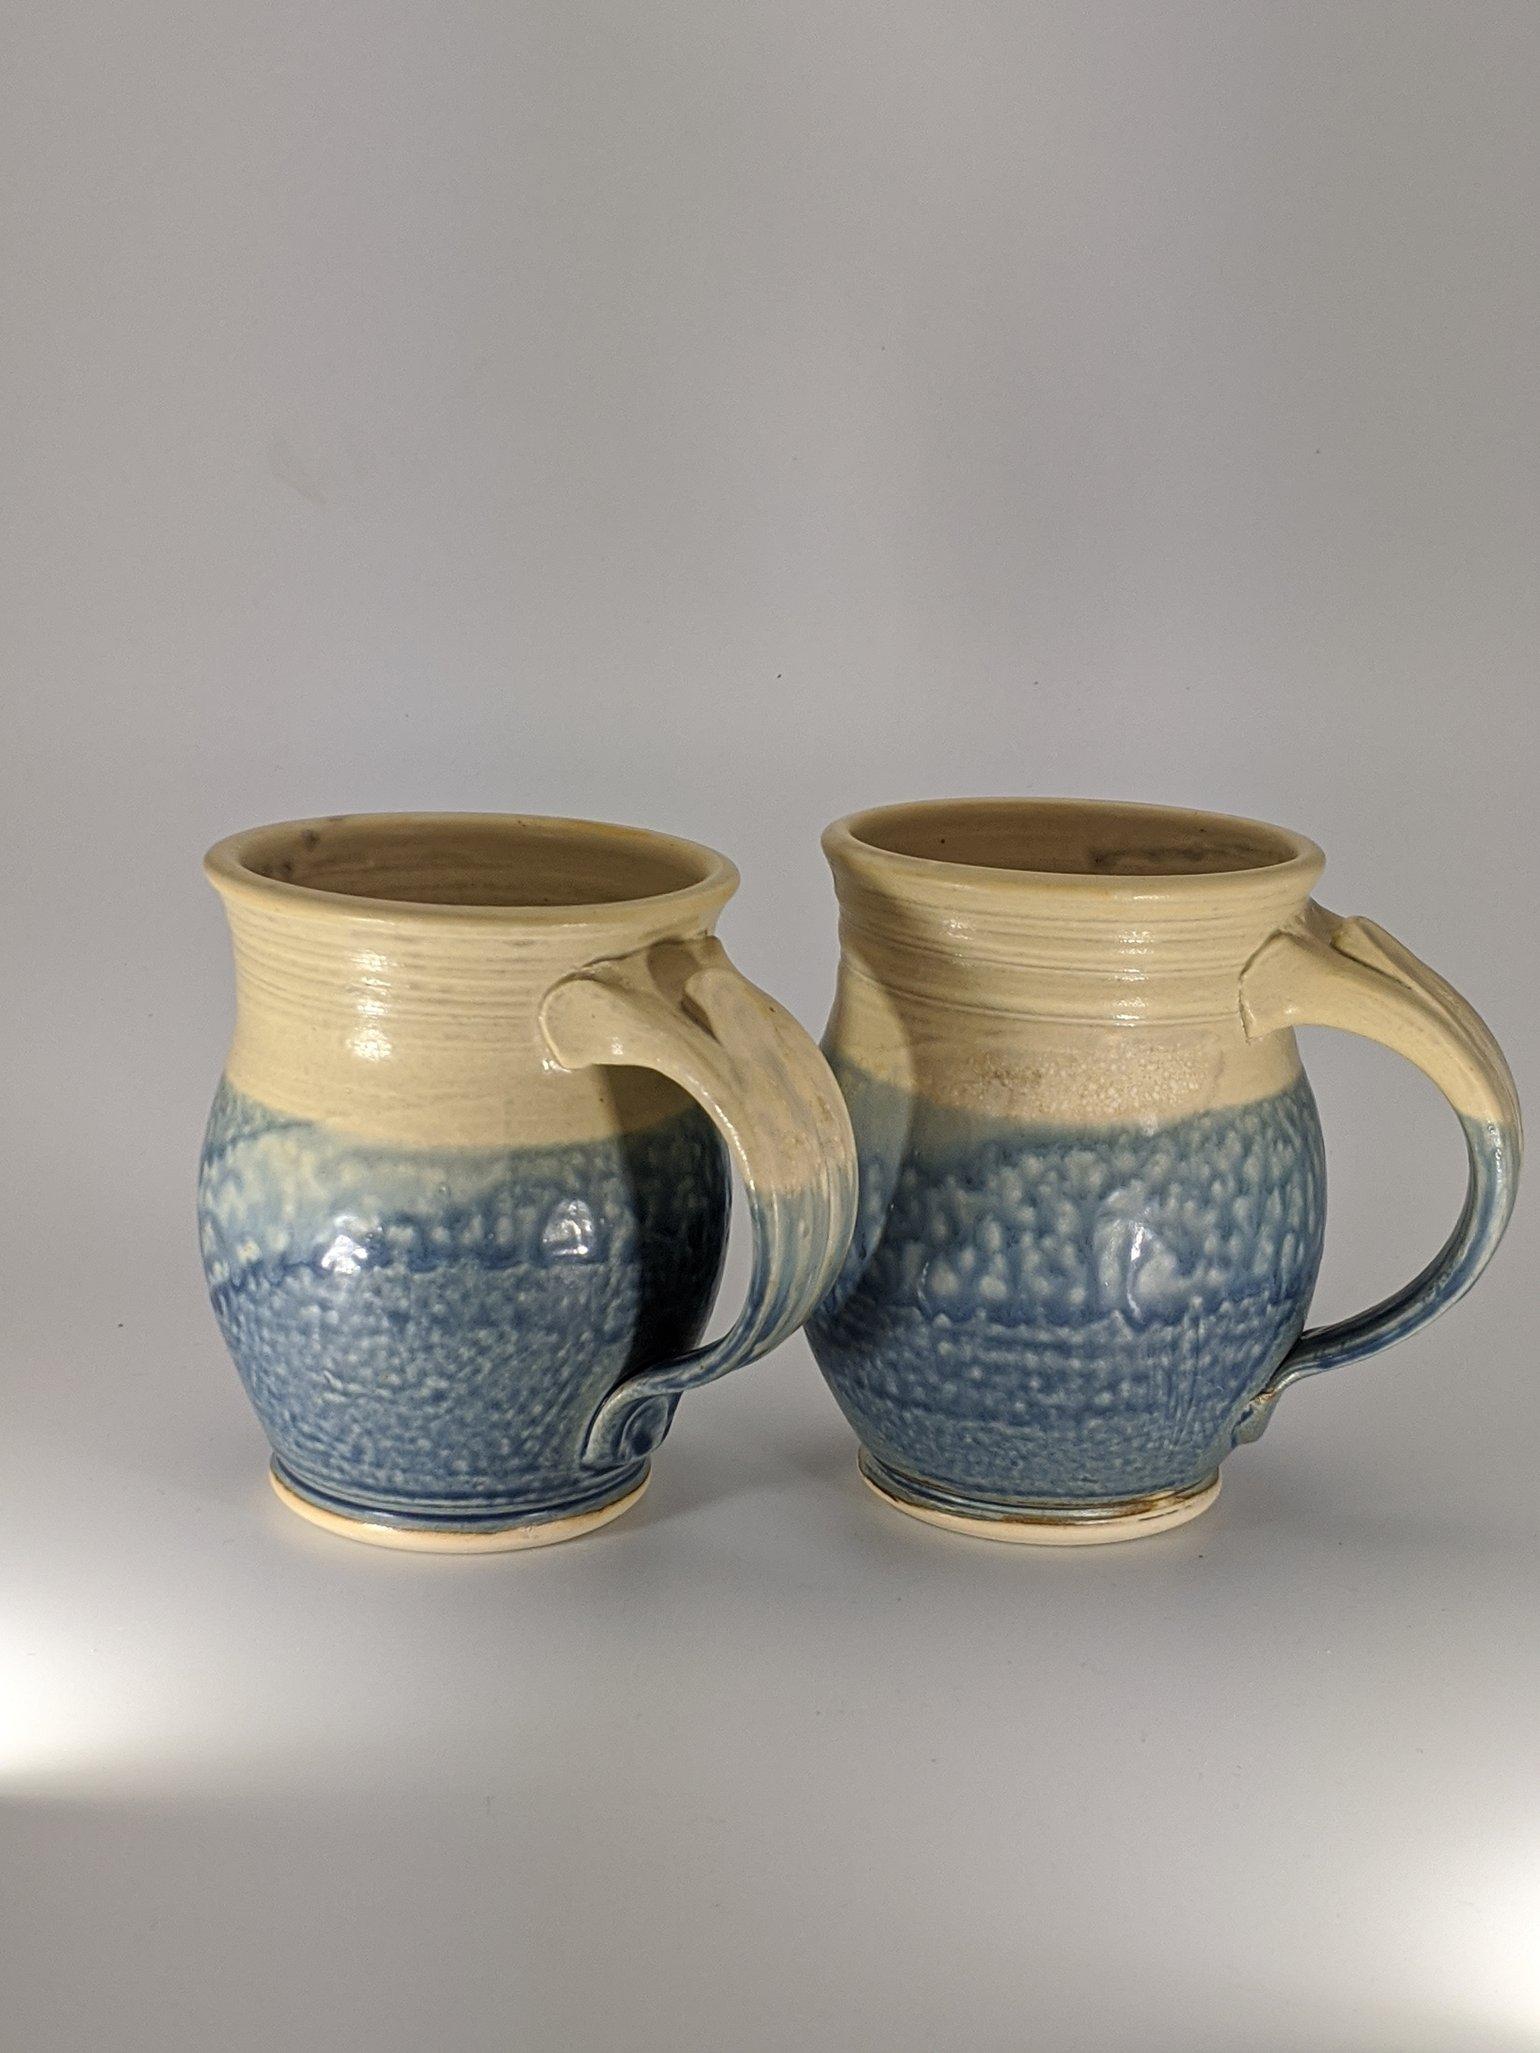 Image of Pair of Sunrise Mugs